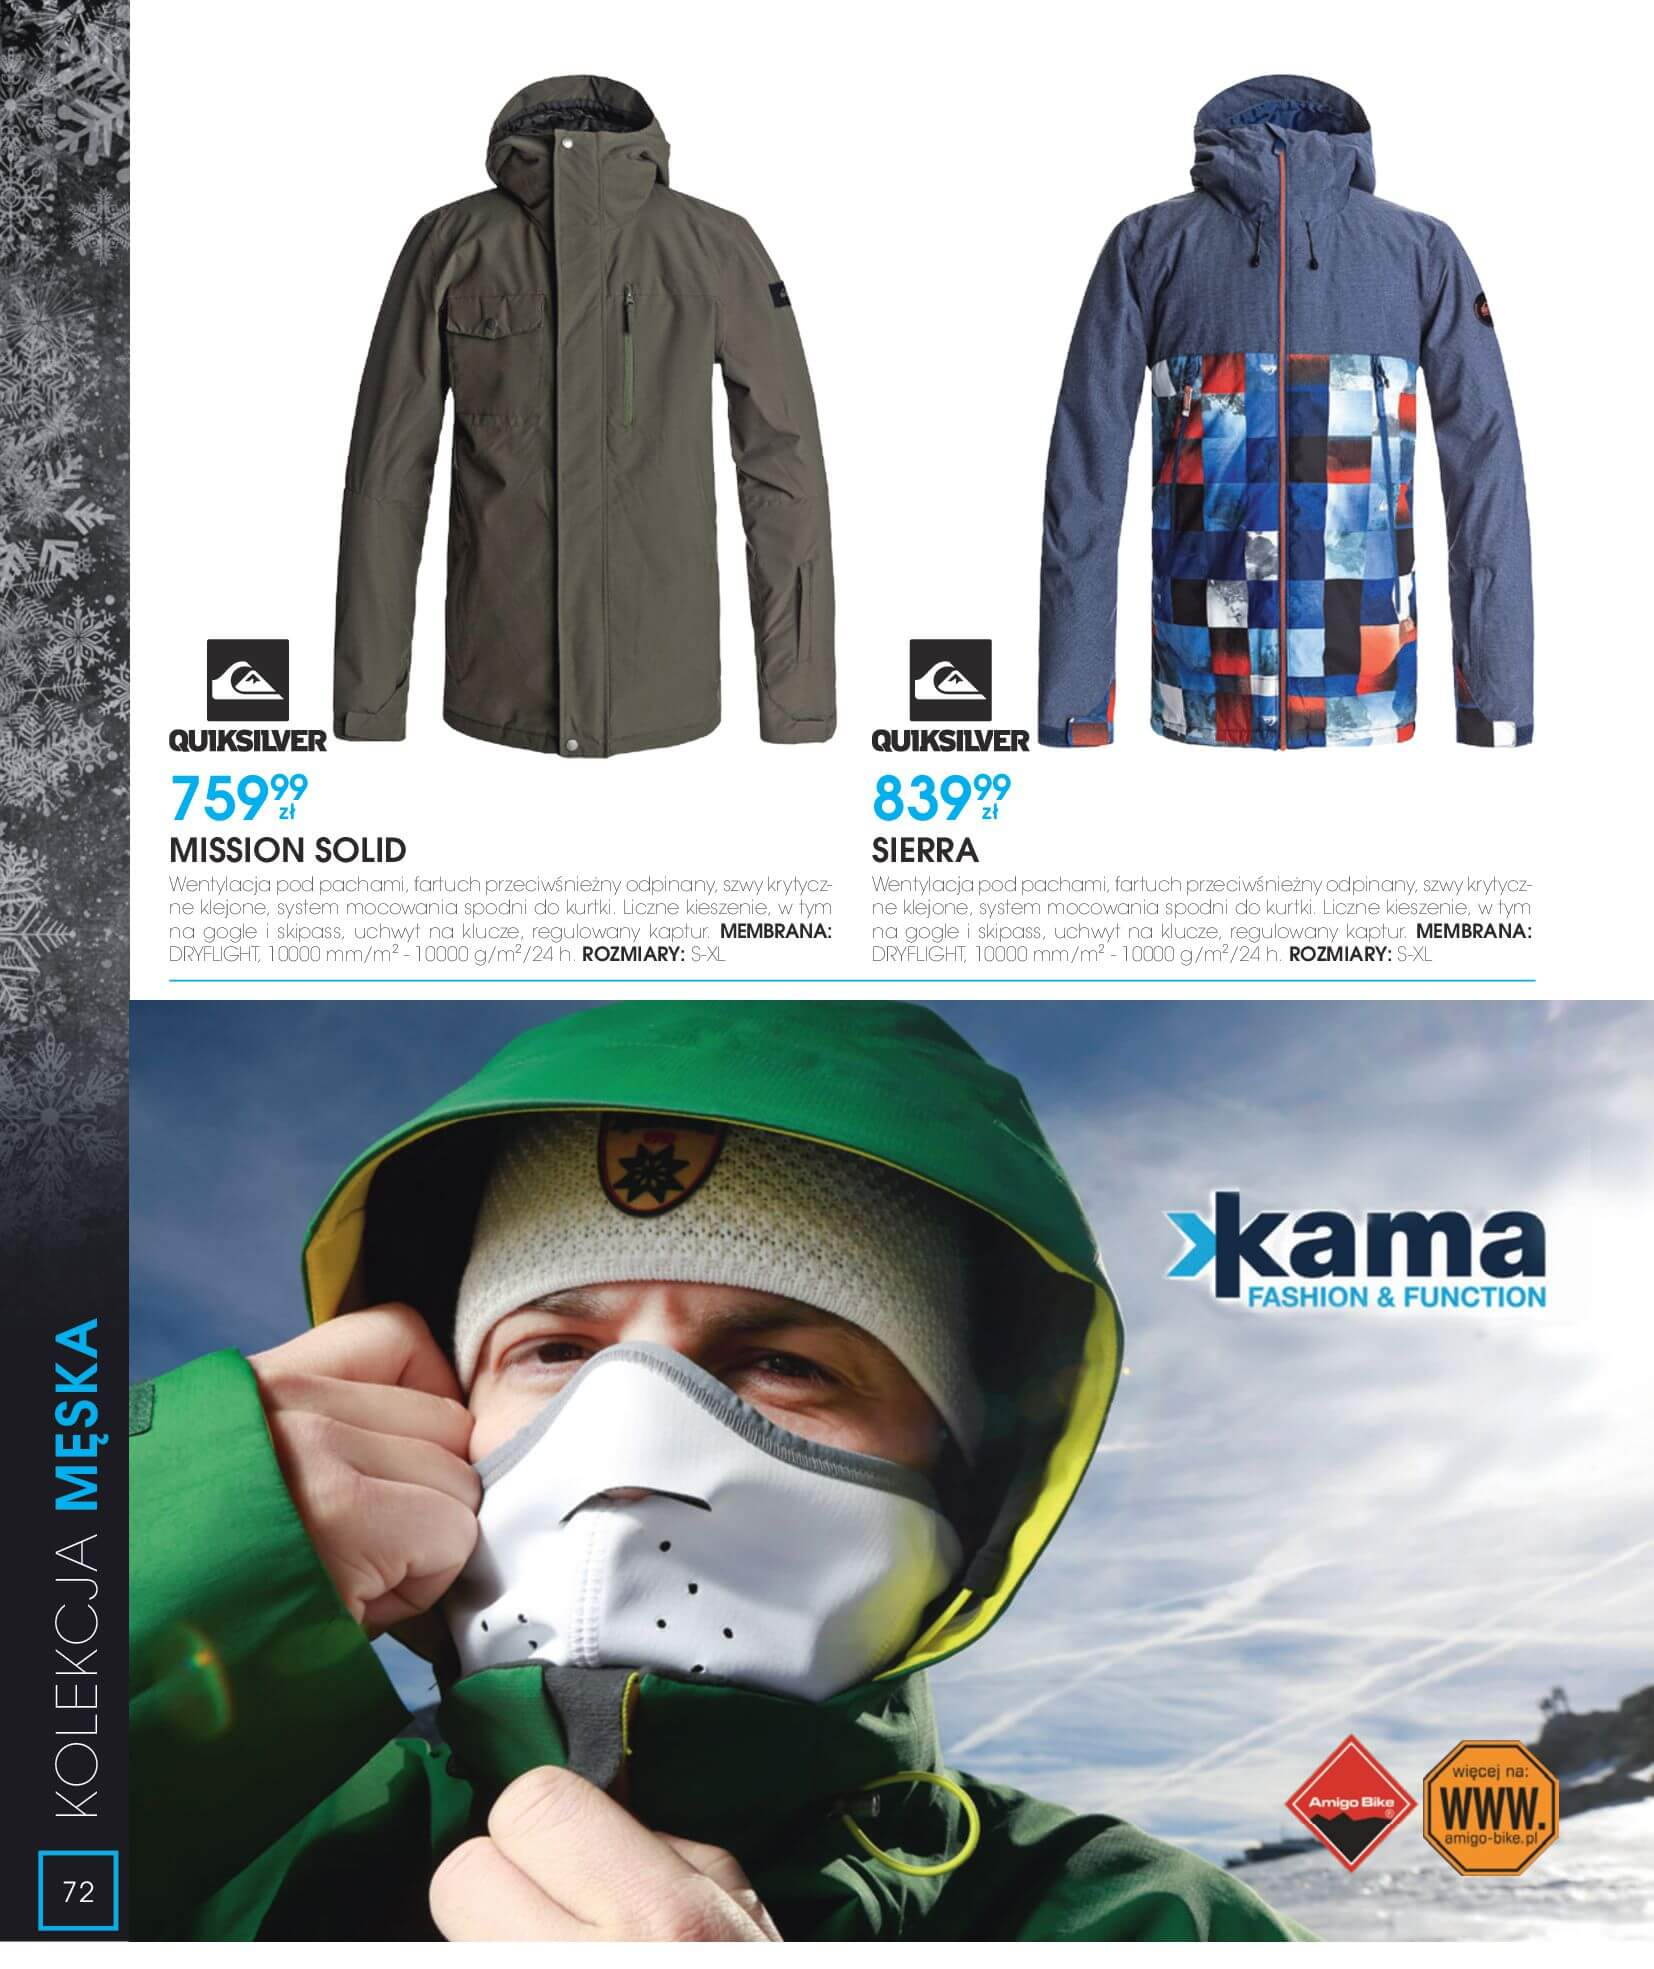 Gazetka Go Sport - Katalog Zima 2017/2018-12.11.2017-28.02.2018-page-72